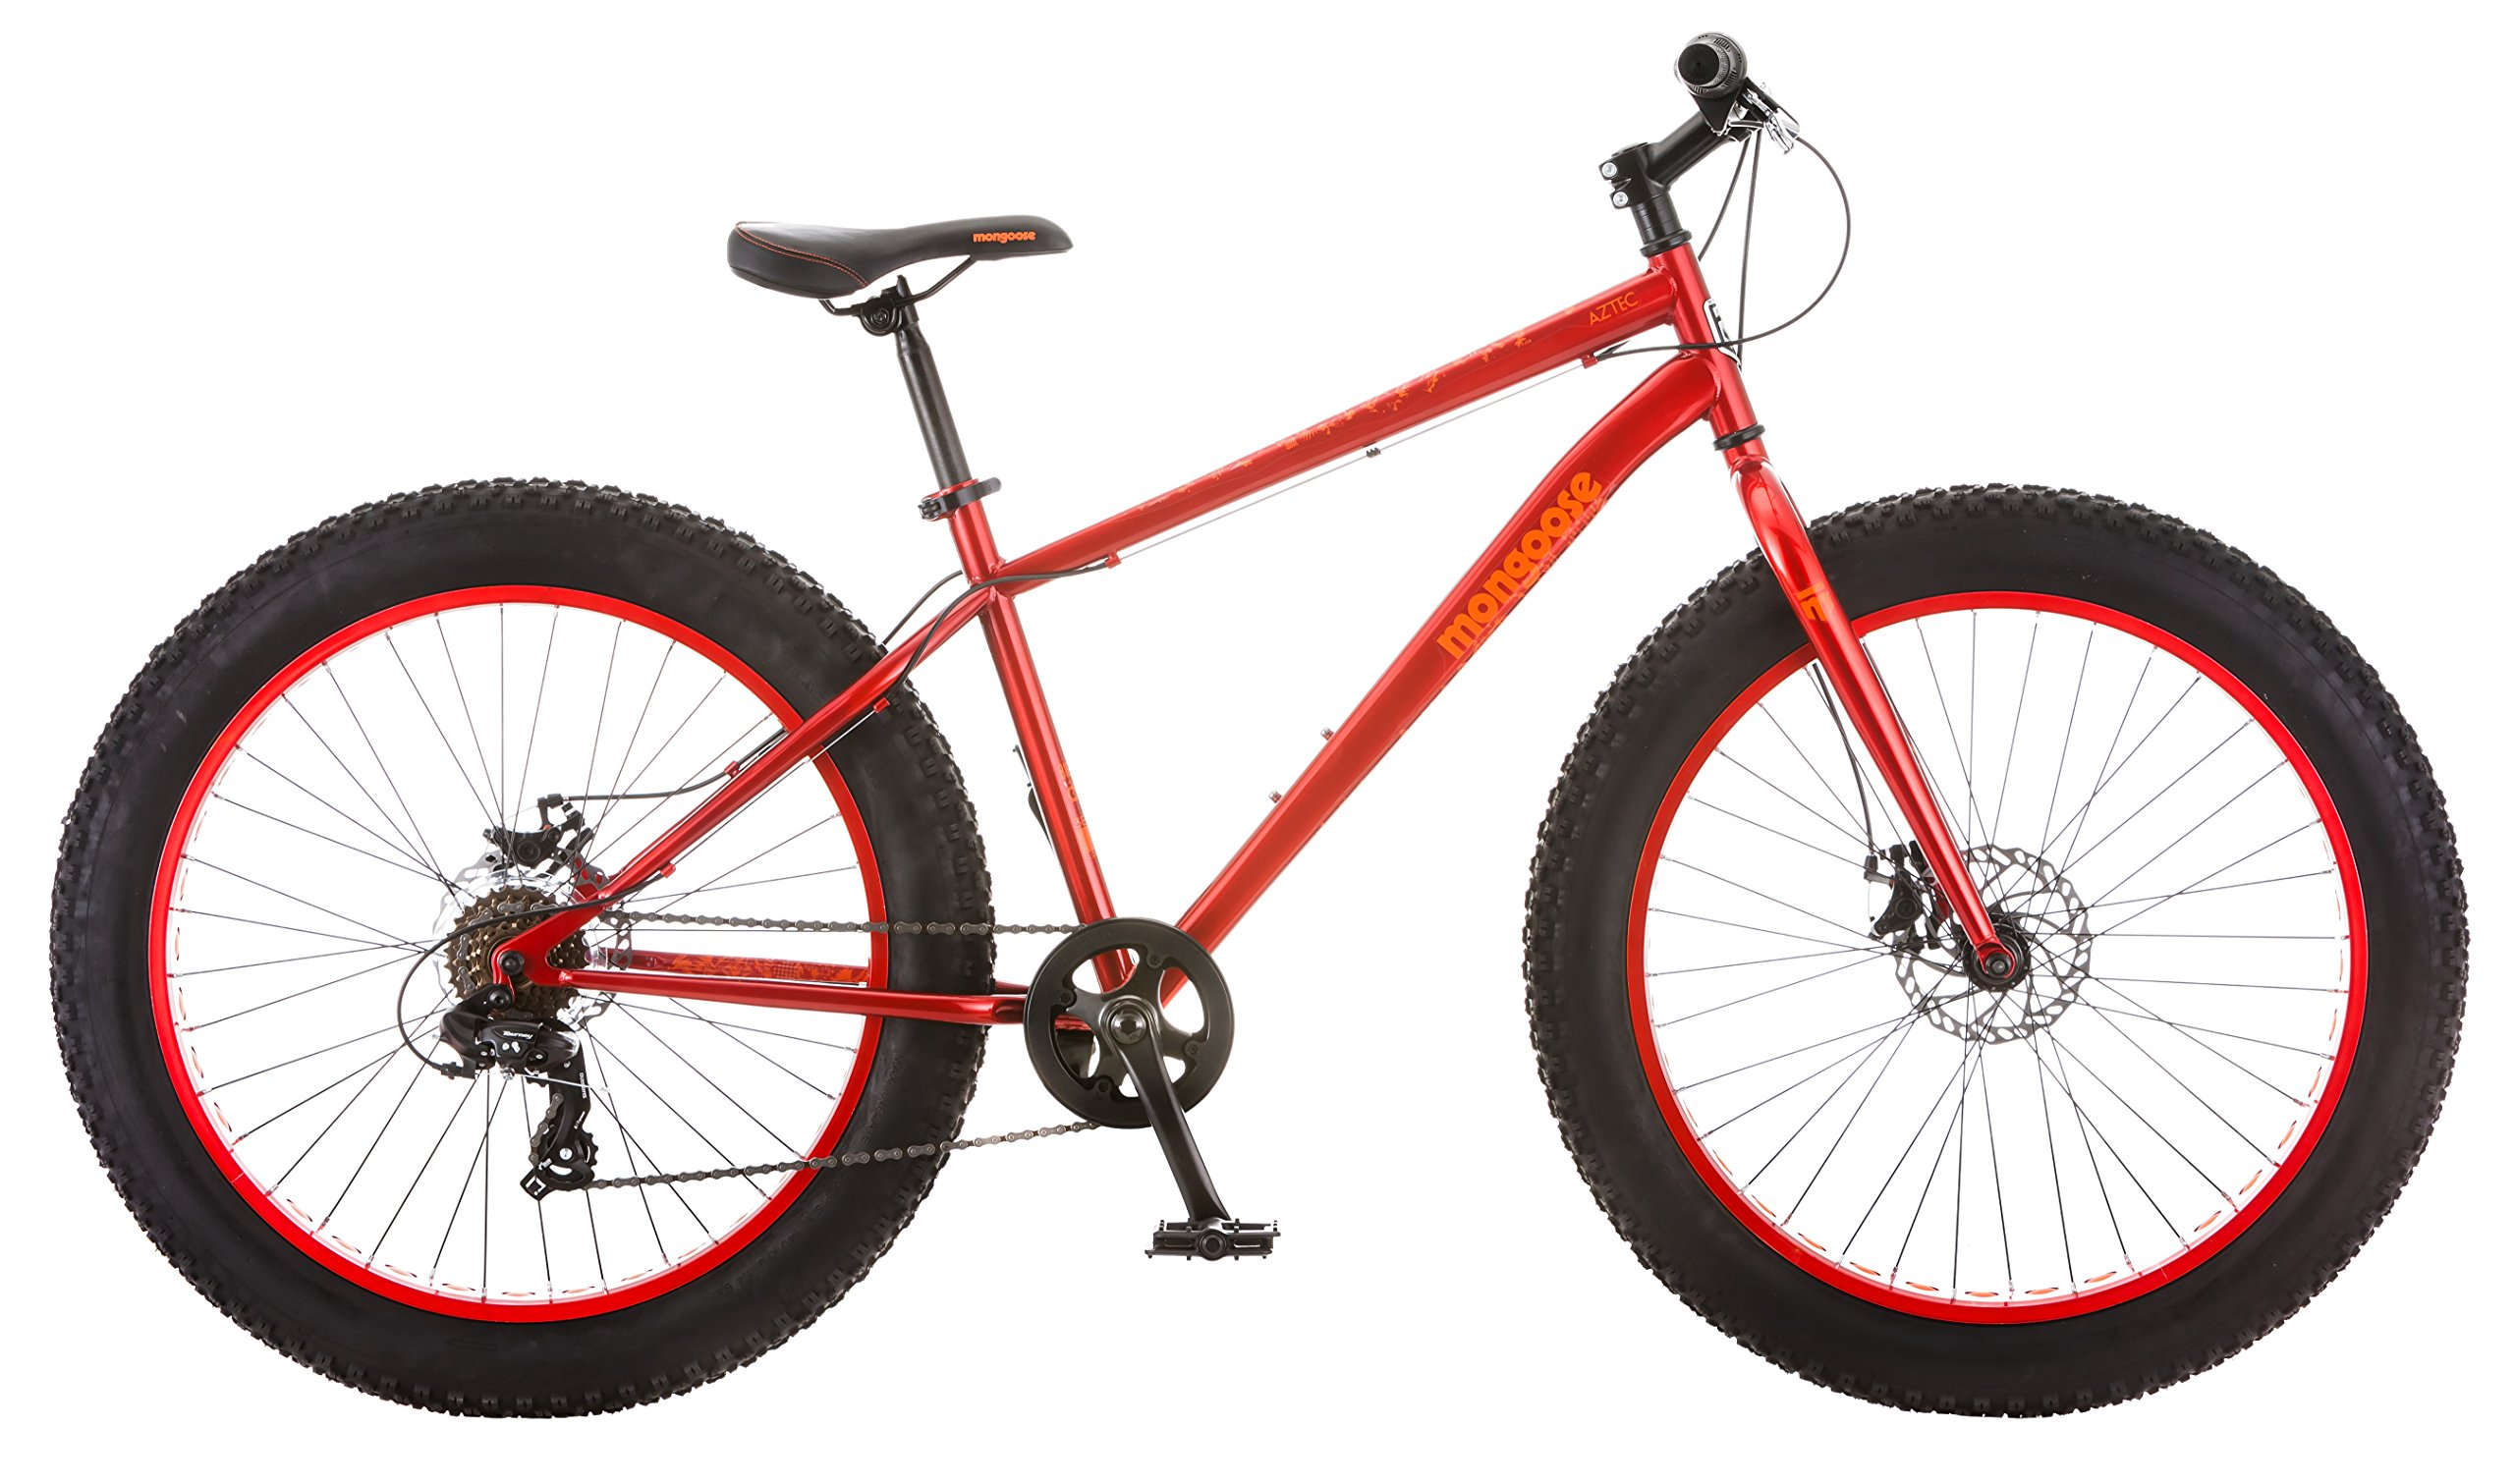 Bicicleta con llanta de grasa azteca mangosta, roja